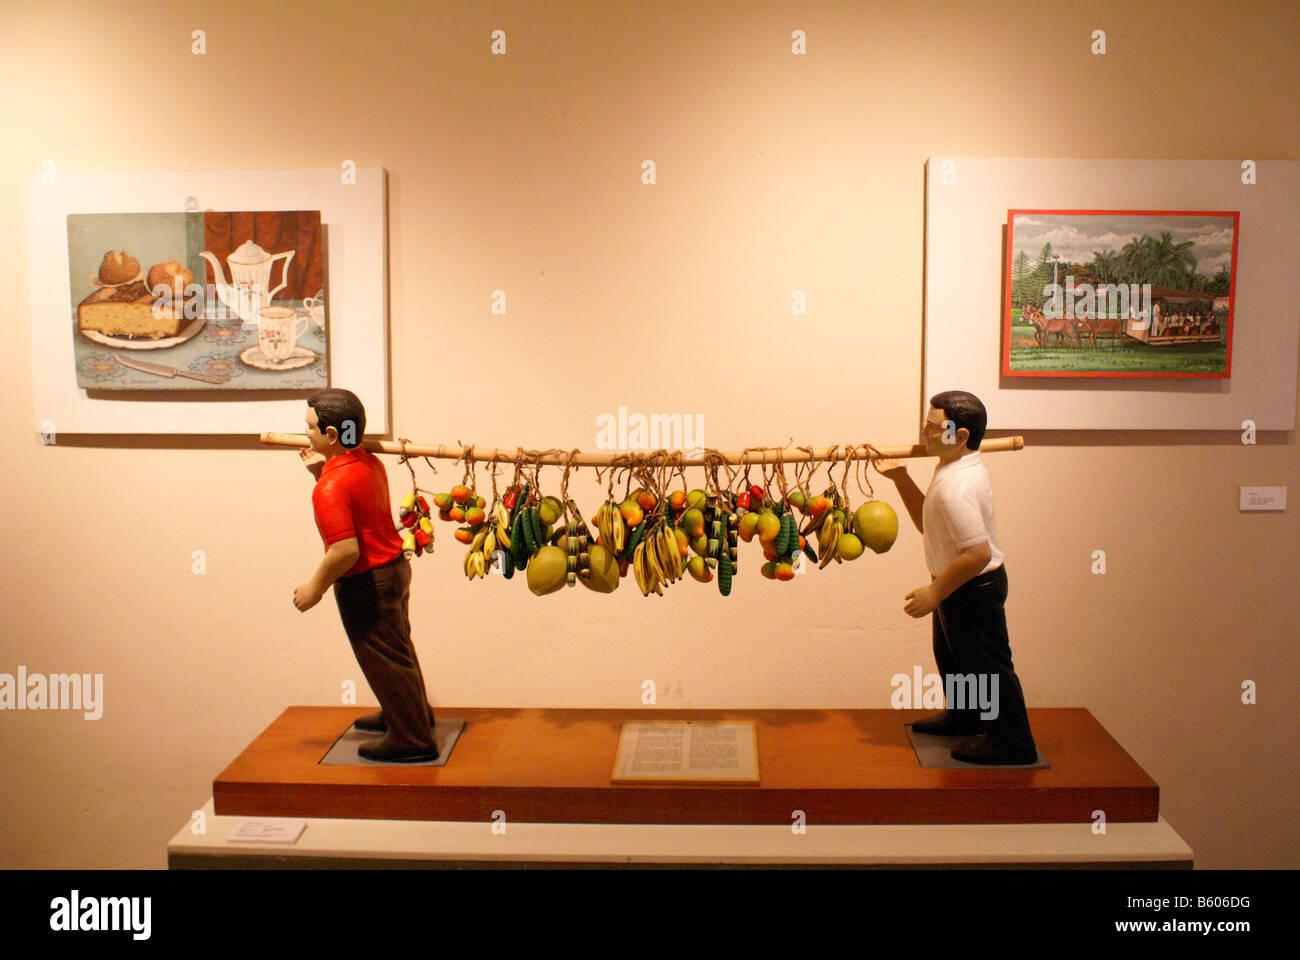 Contemporary folk art in the Museo de Arte Popular or Museum of Popular Art in San Salvador, El Salvador - Stock Image